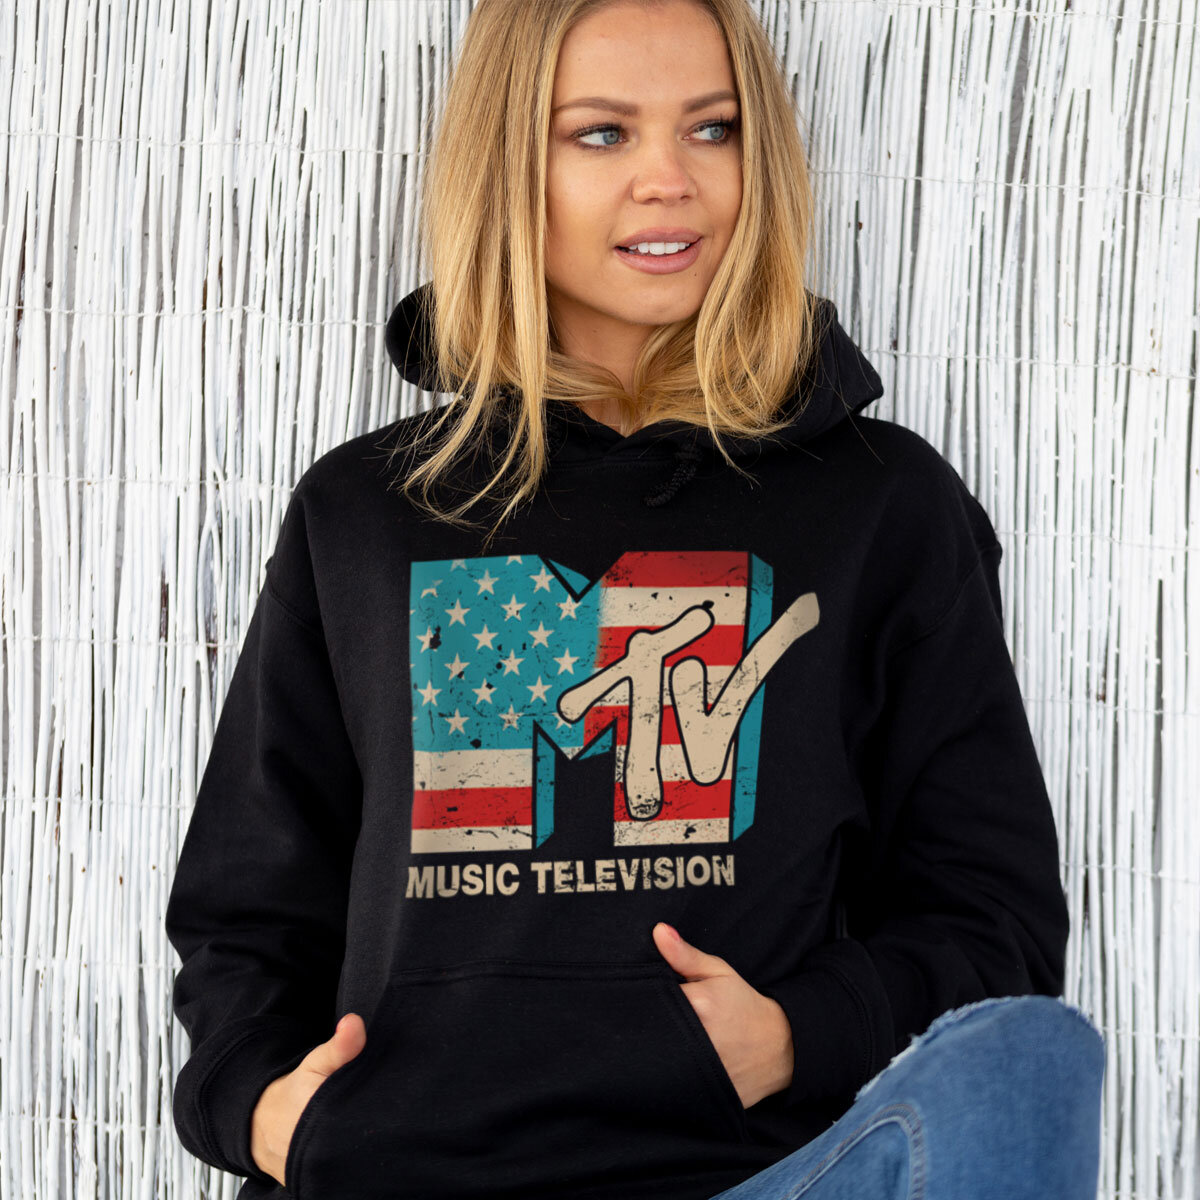 https://www.shirt-store.com/pub_docs/files/Kläder/GirlsHoodie_Big.jpg